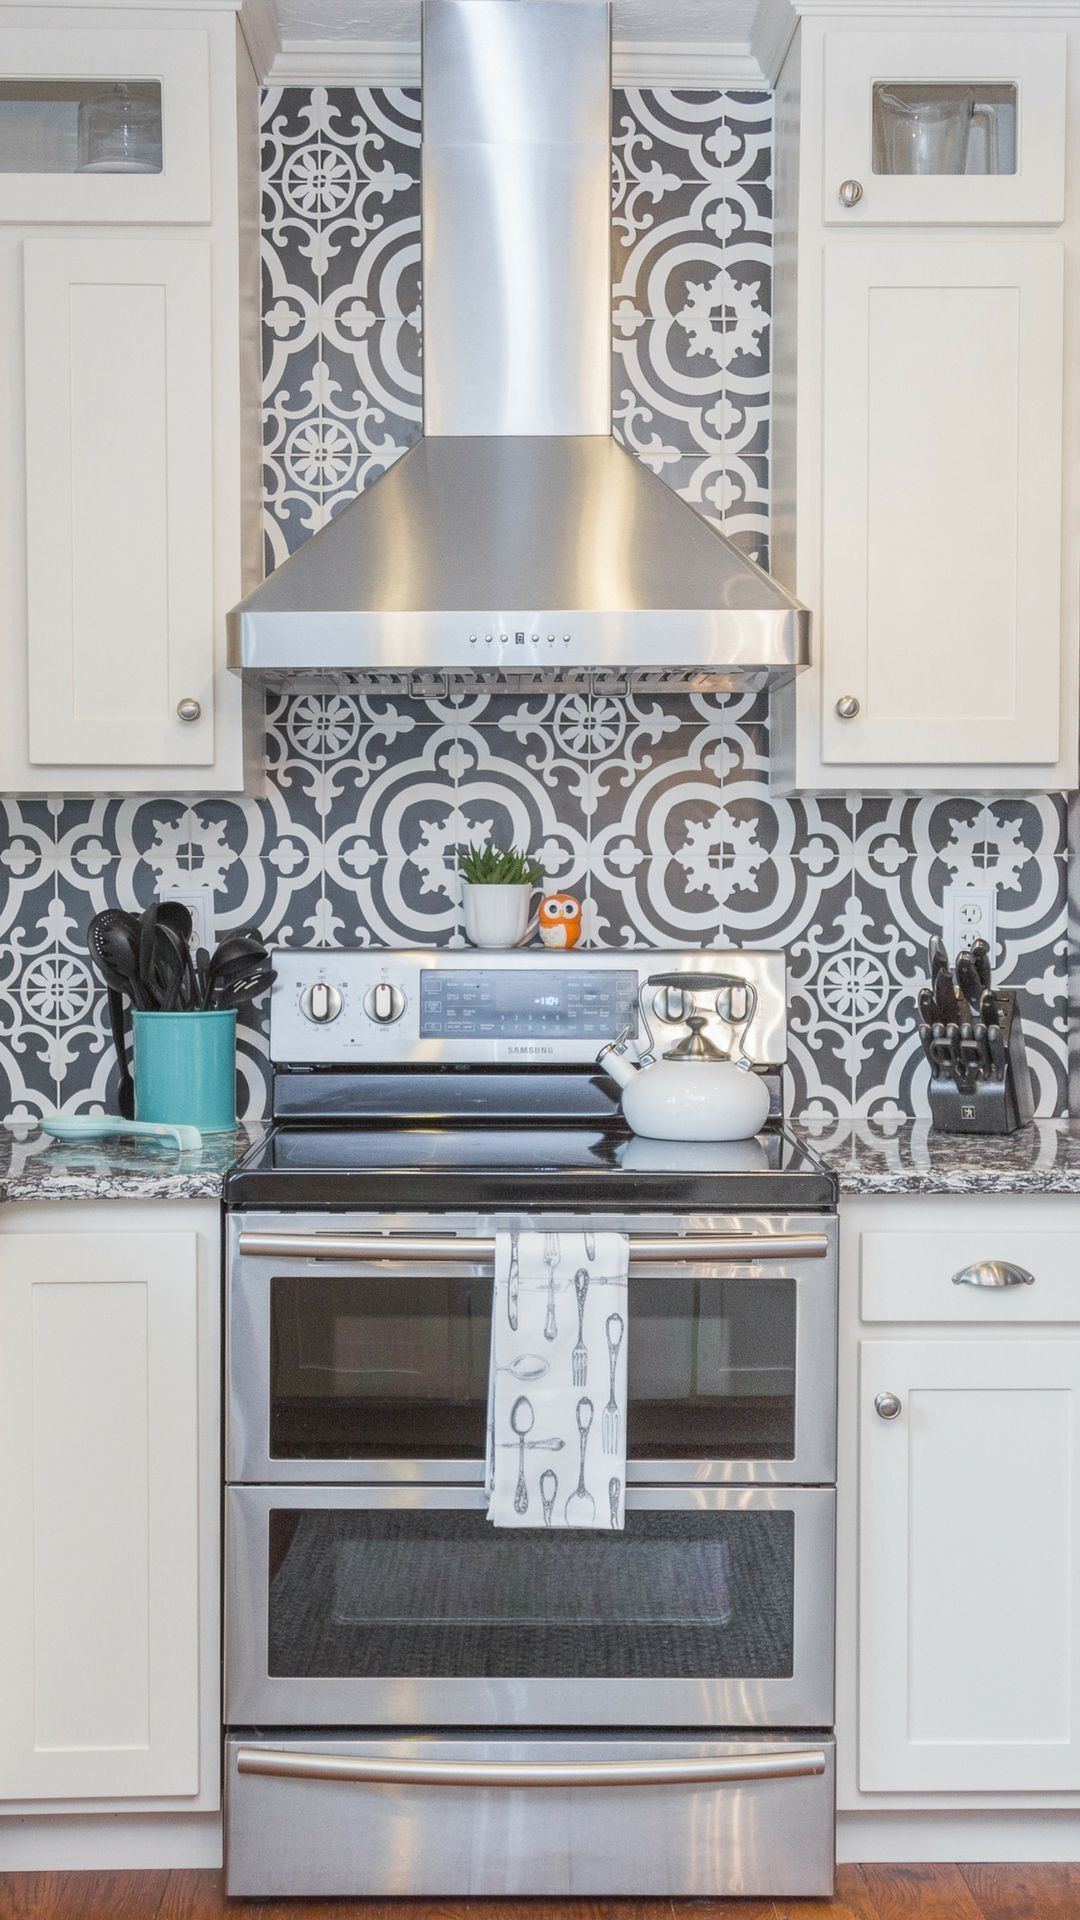 Kitchen with no window  kitchen magic cabinet refacing project kitchenrefacing  kitchen